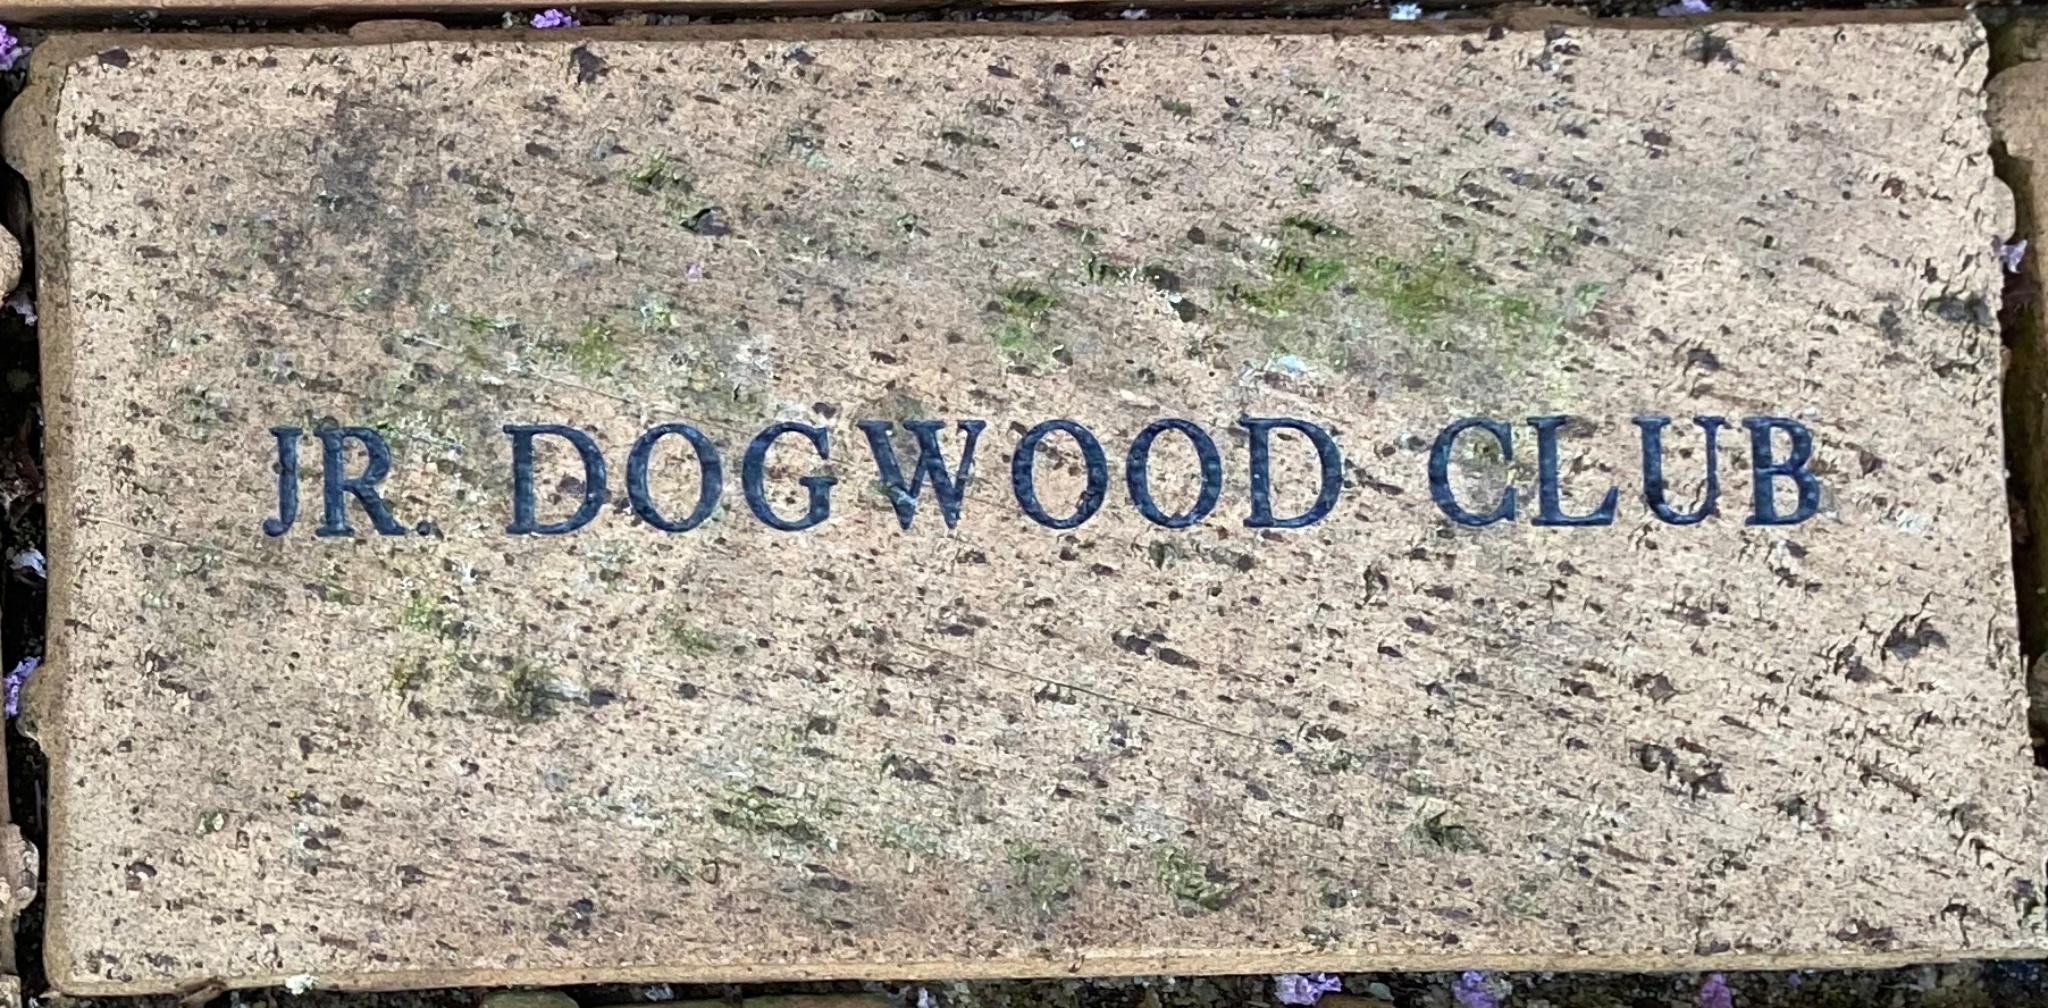 JR. DOGWOOD CLUB